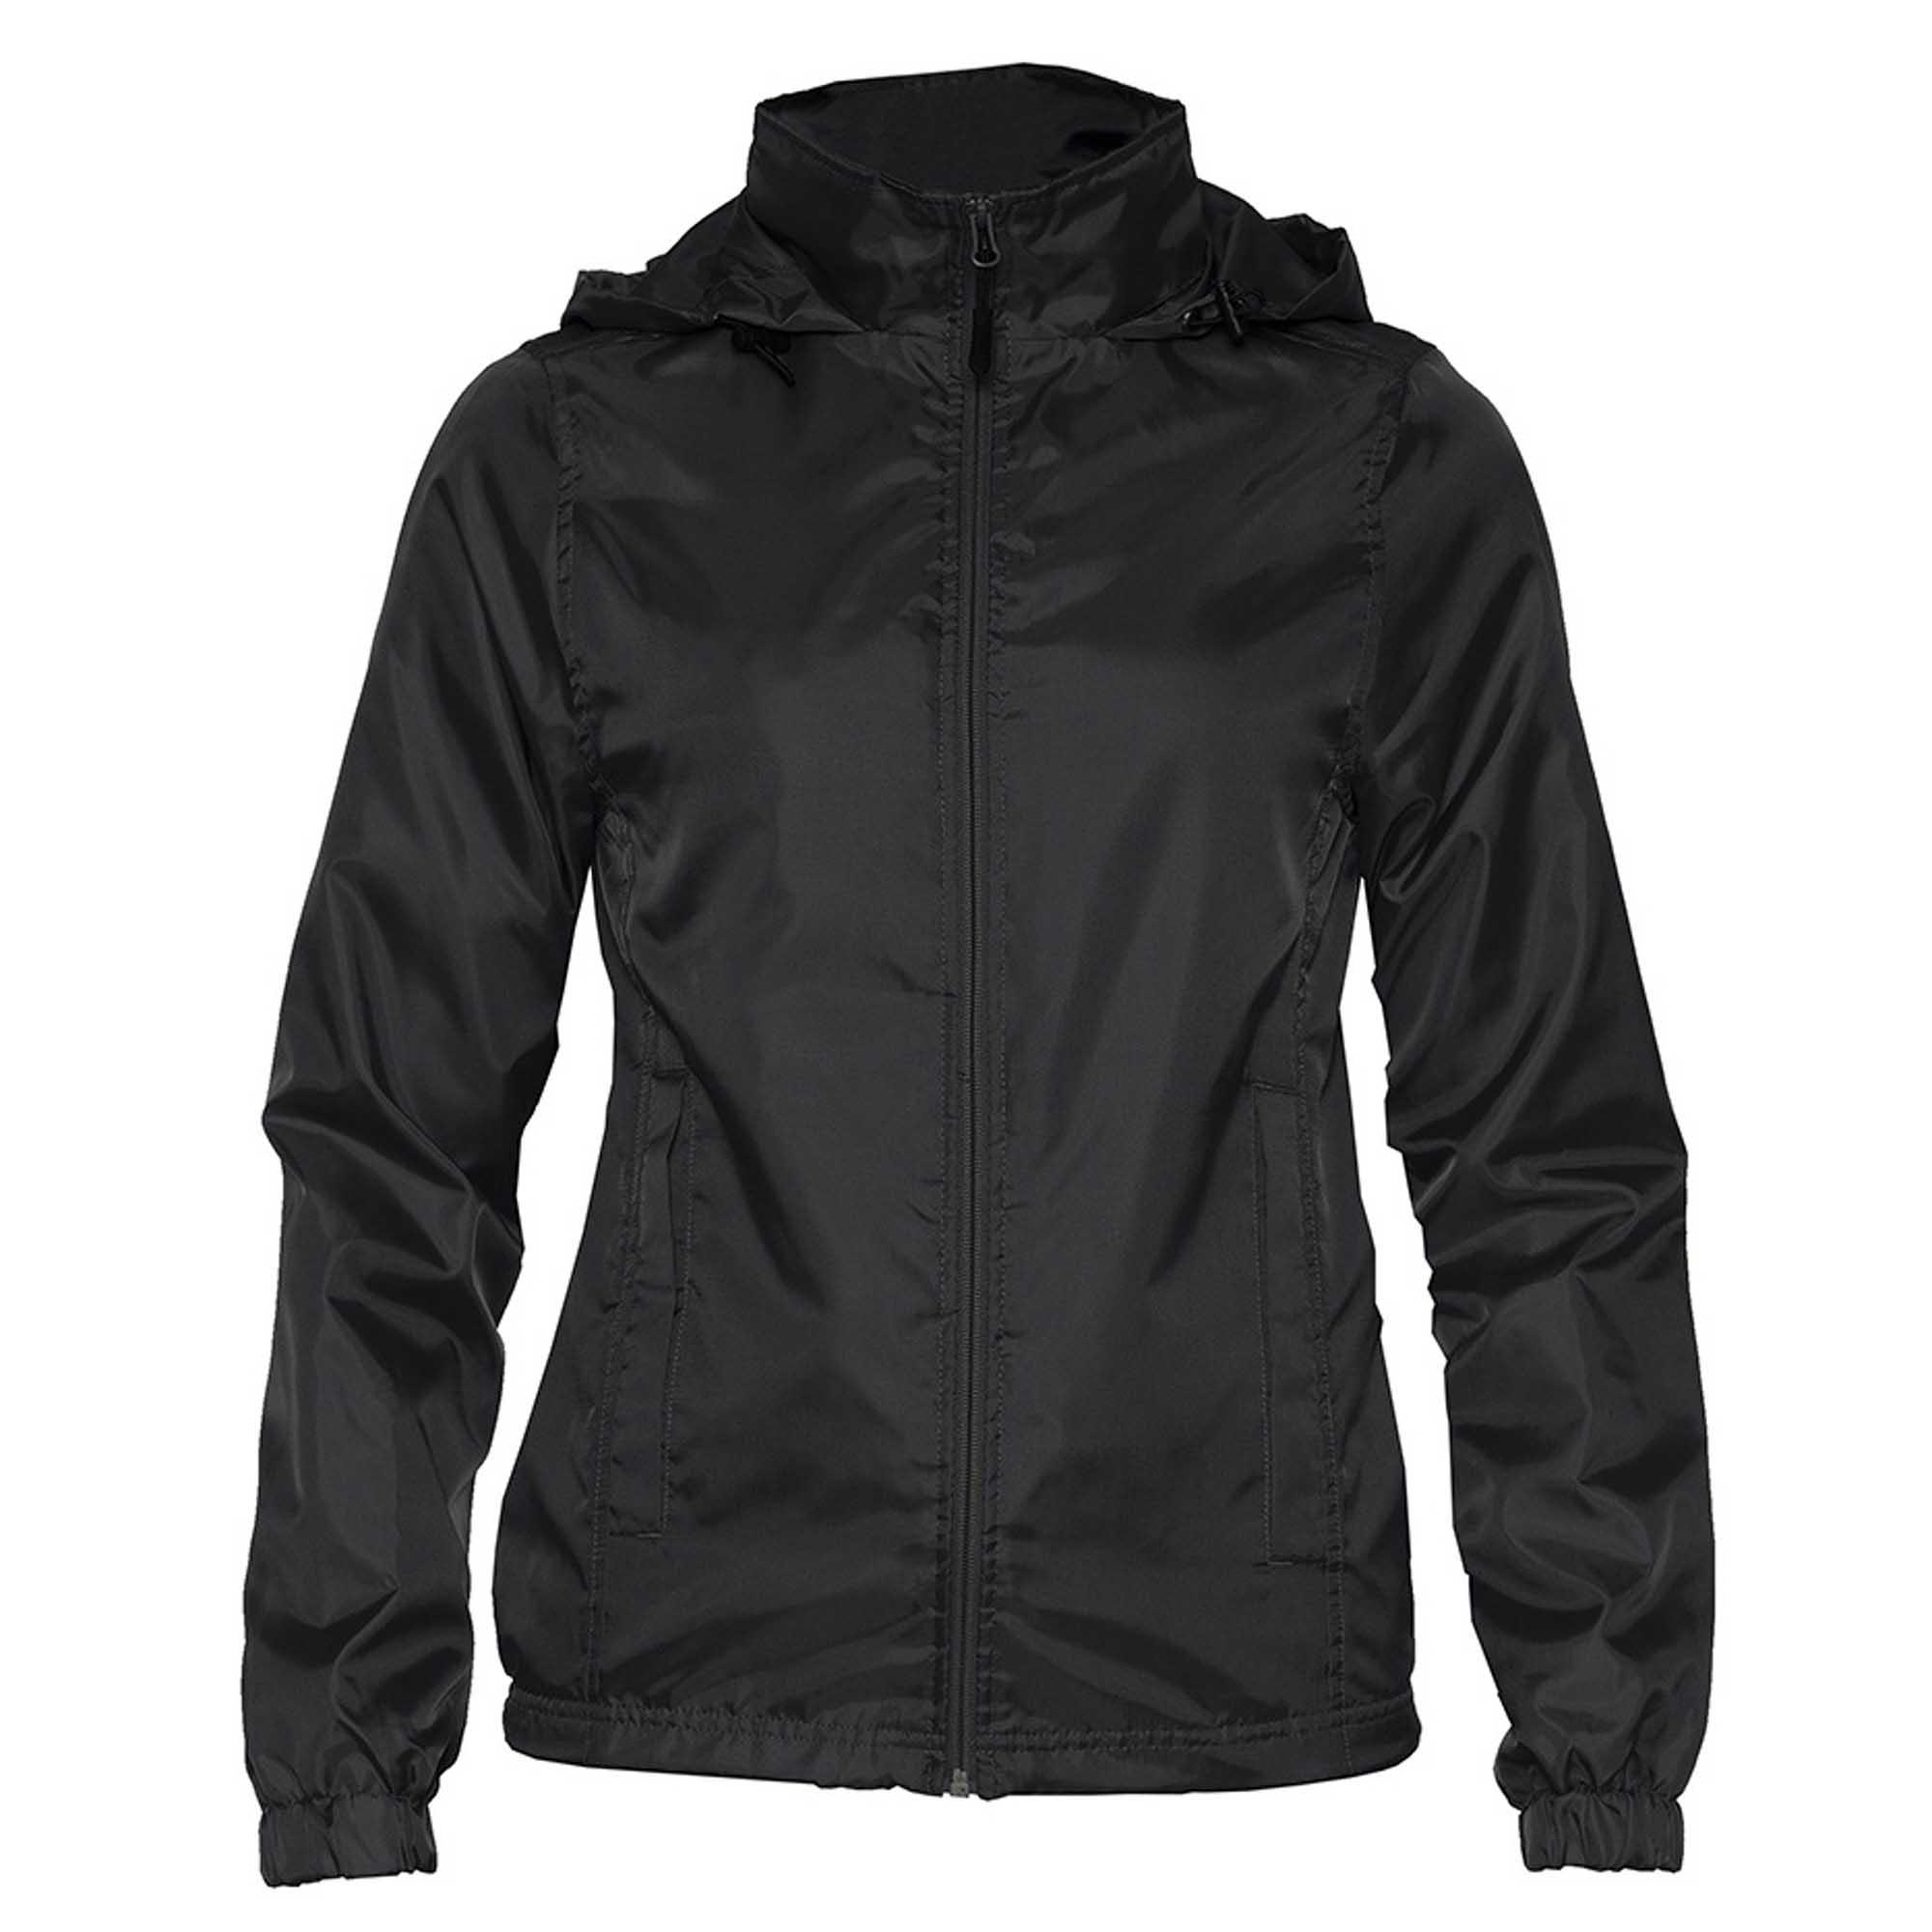 Gildan Womens/Ladies Hammer Windwear Jacket (XL) (Black)